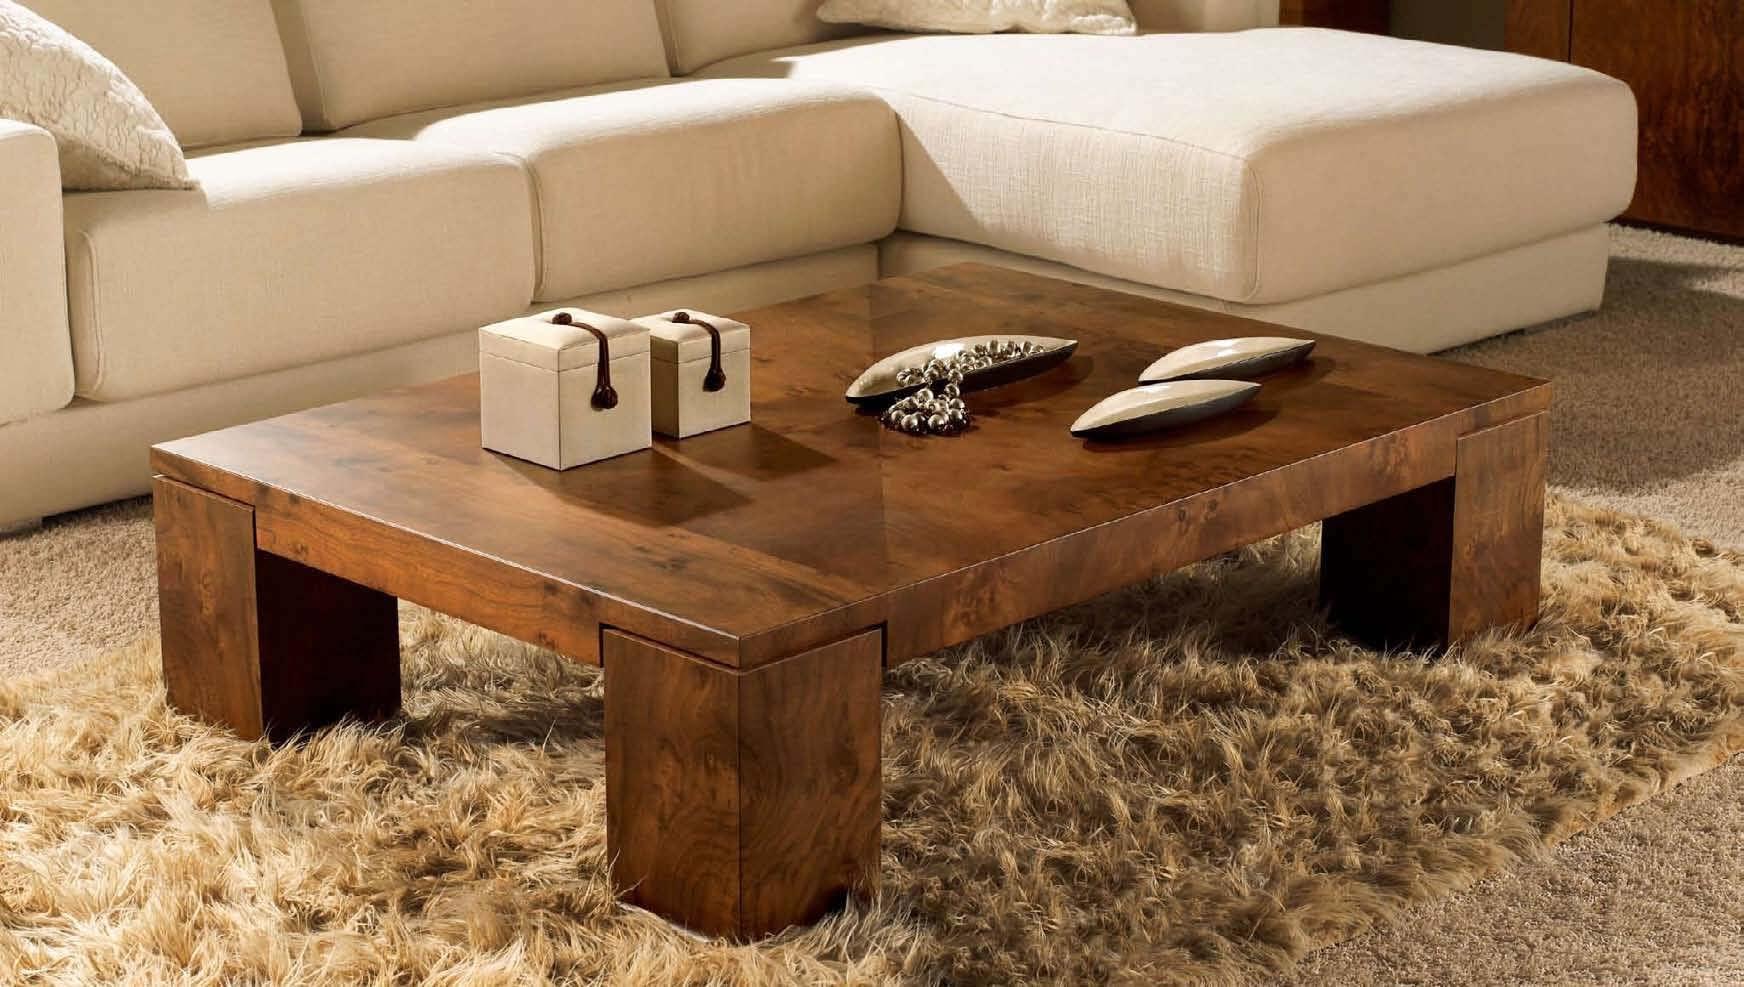 Modern Rustic Coffee Table | Gestablishment Home Ideas : Rustic Inside Modern Rustic Coffee Tables (View 25 of 30)